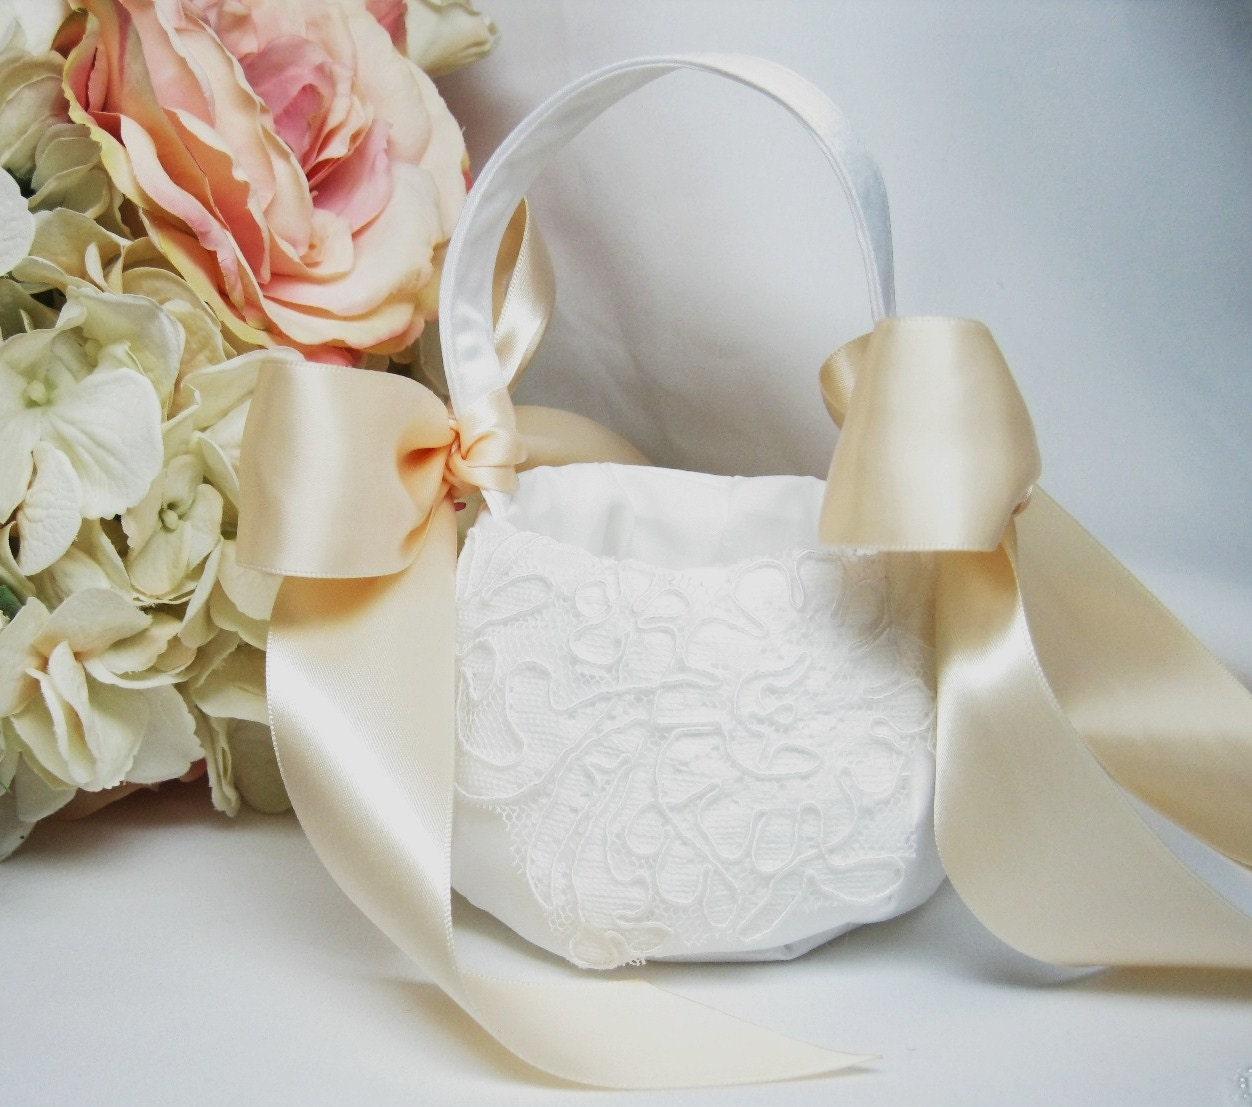 Flower Girl Basket Blush : Blush and white flower girl baskets by flowerdancebridal